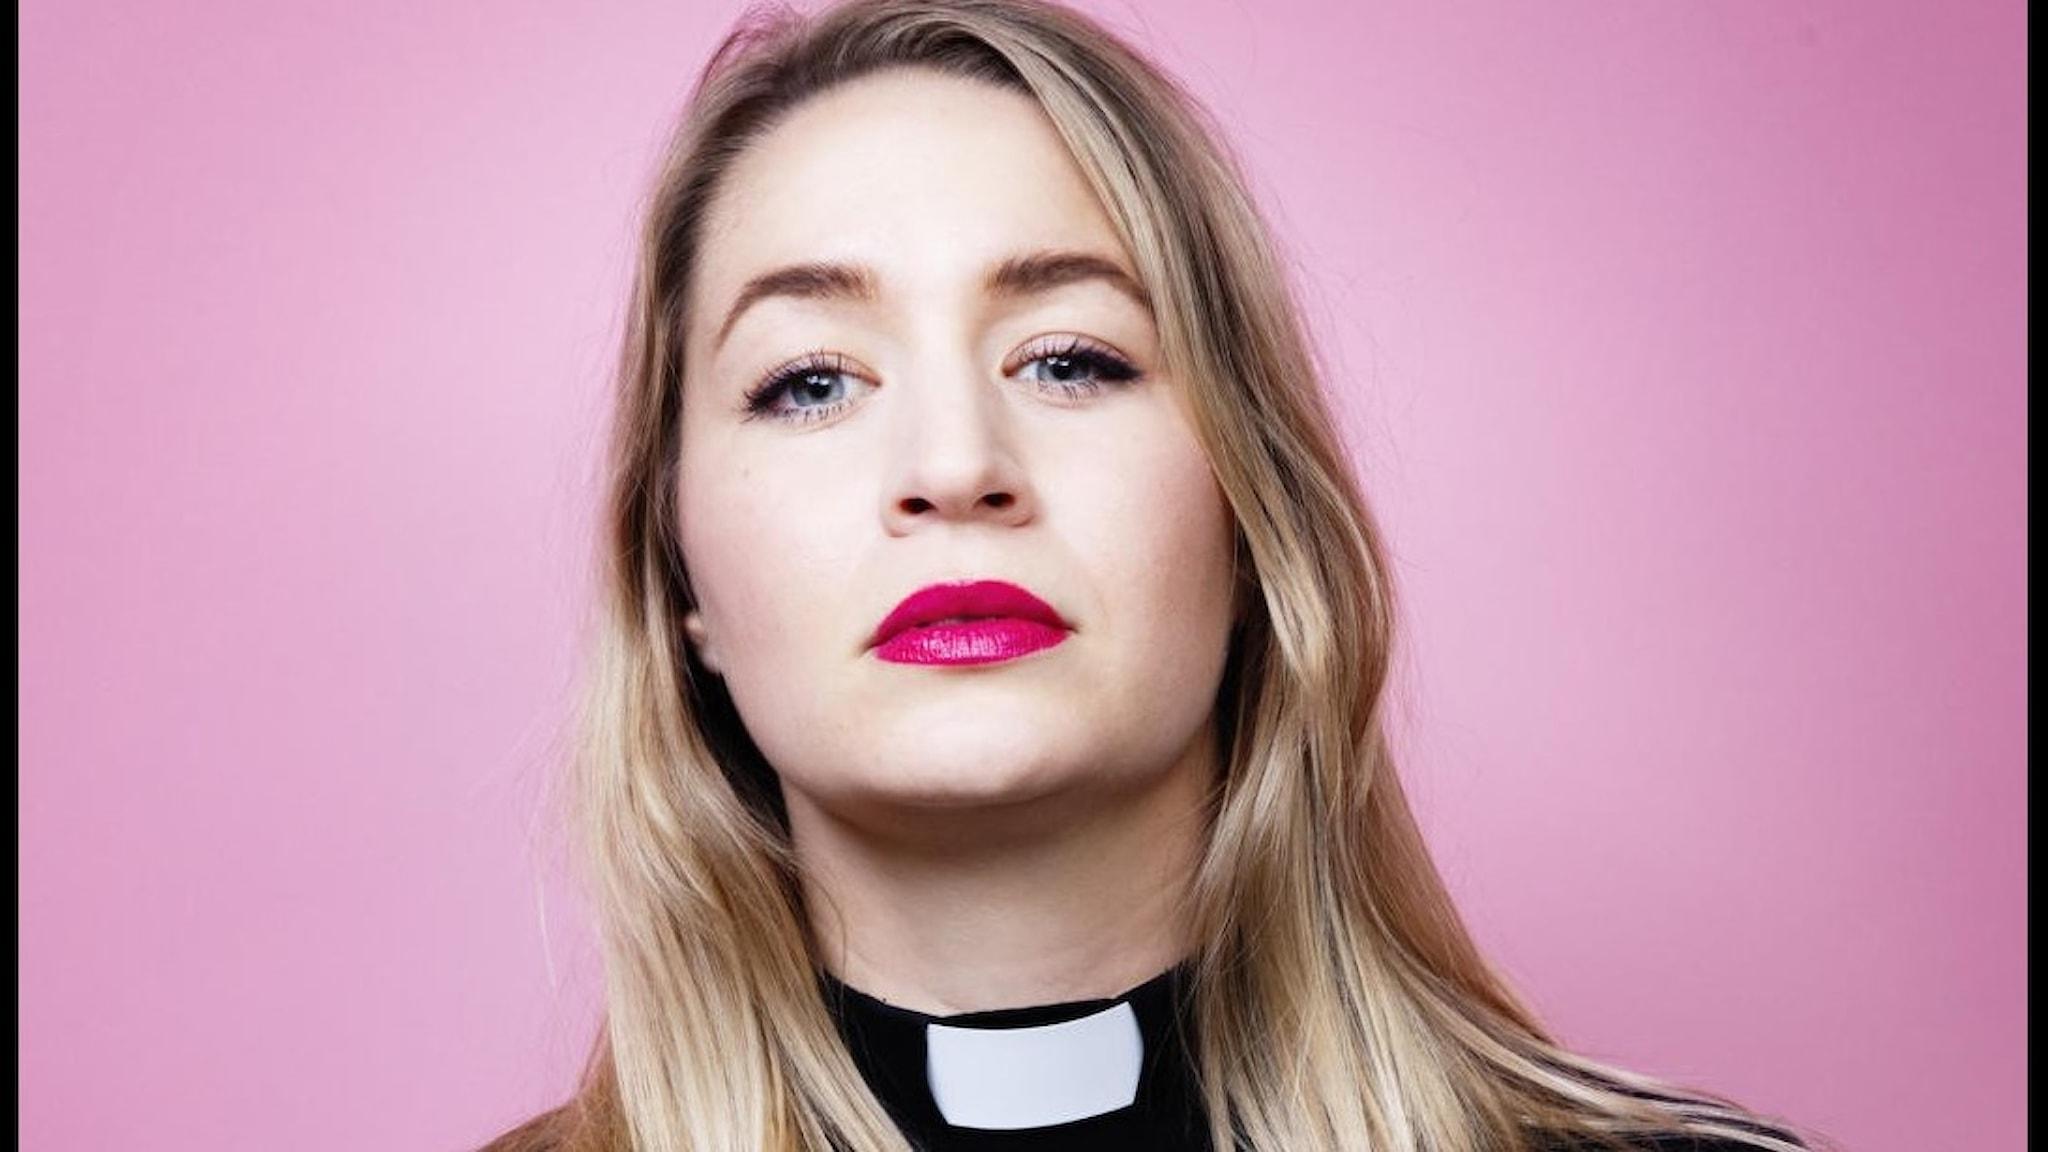 En ung kvinnlig blond pastor med prästkrage mot rosa bakgrund